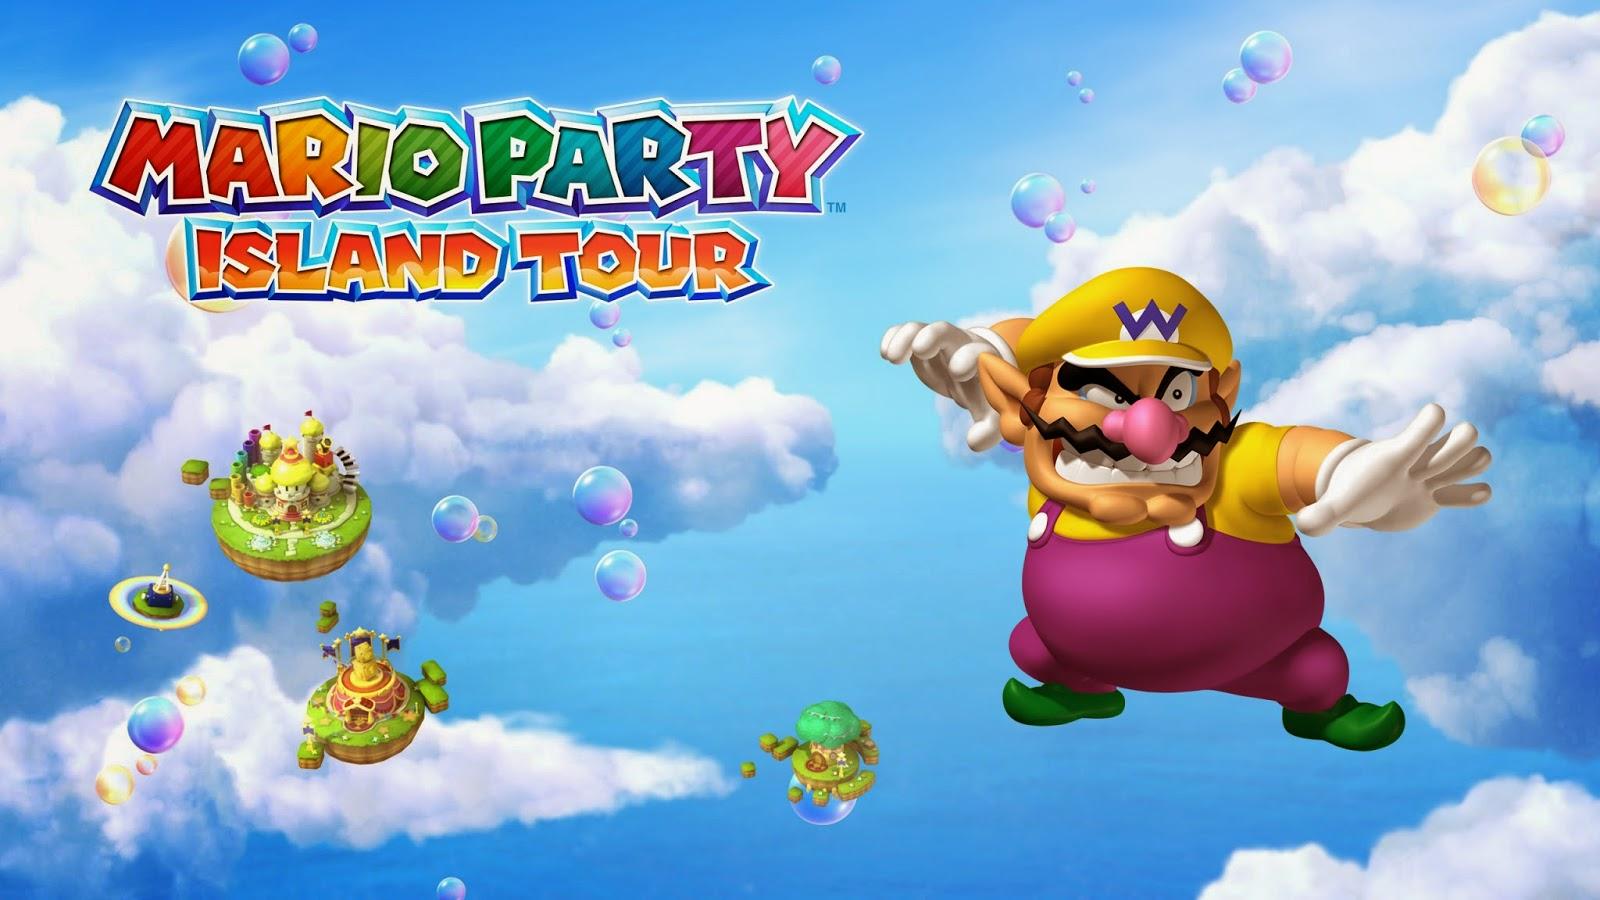 My Super Mario Boy Mario Party Island Tour Wallpapers